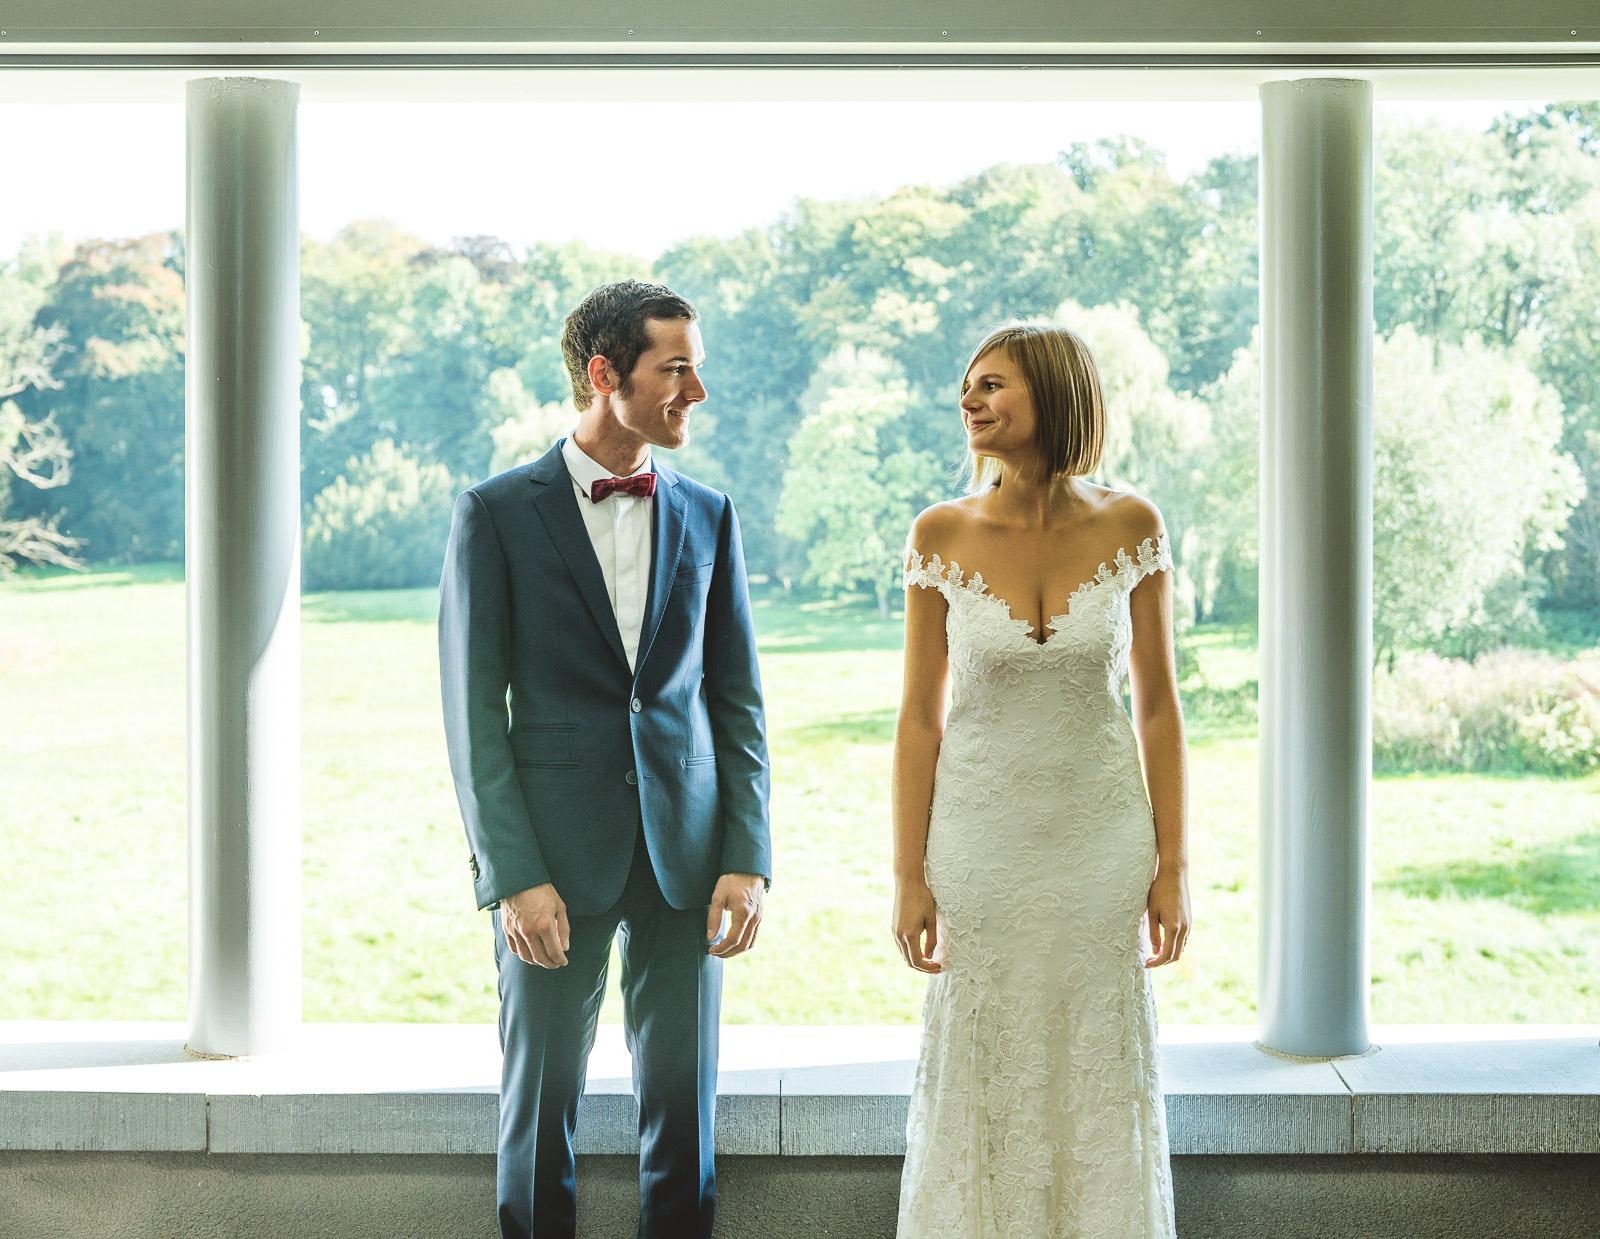 Trouwreportages leuven trouwfotograaf trouwen in regio